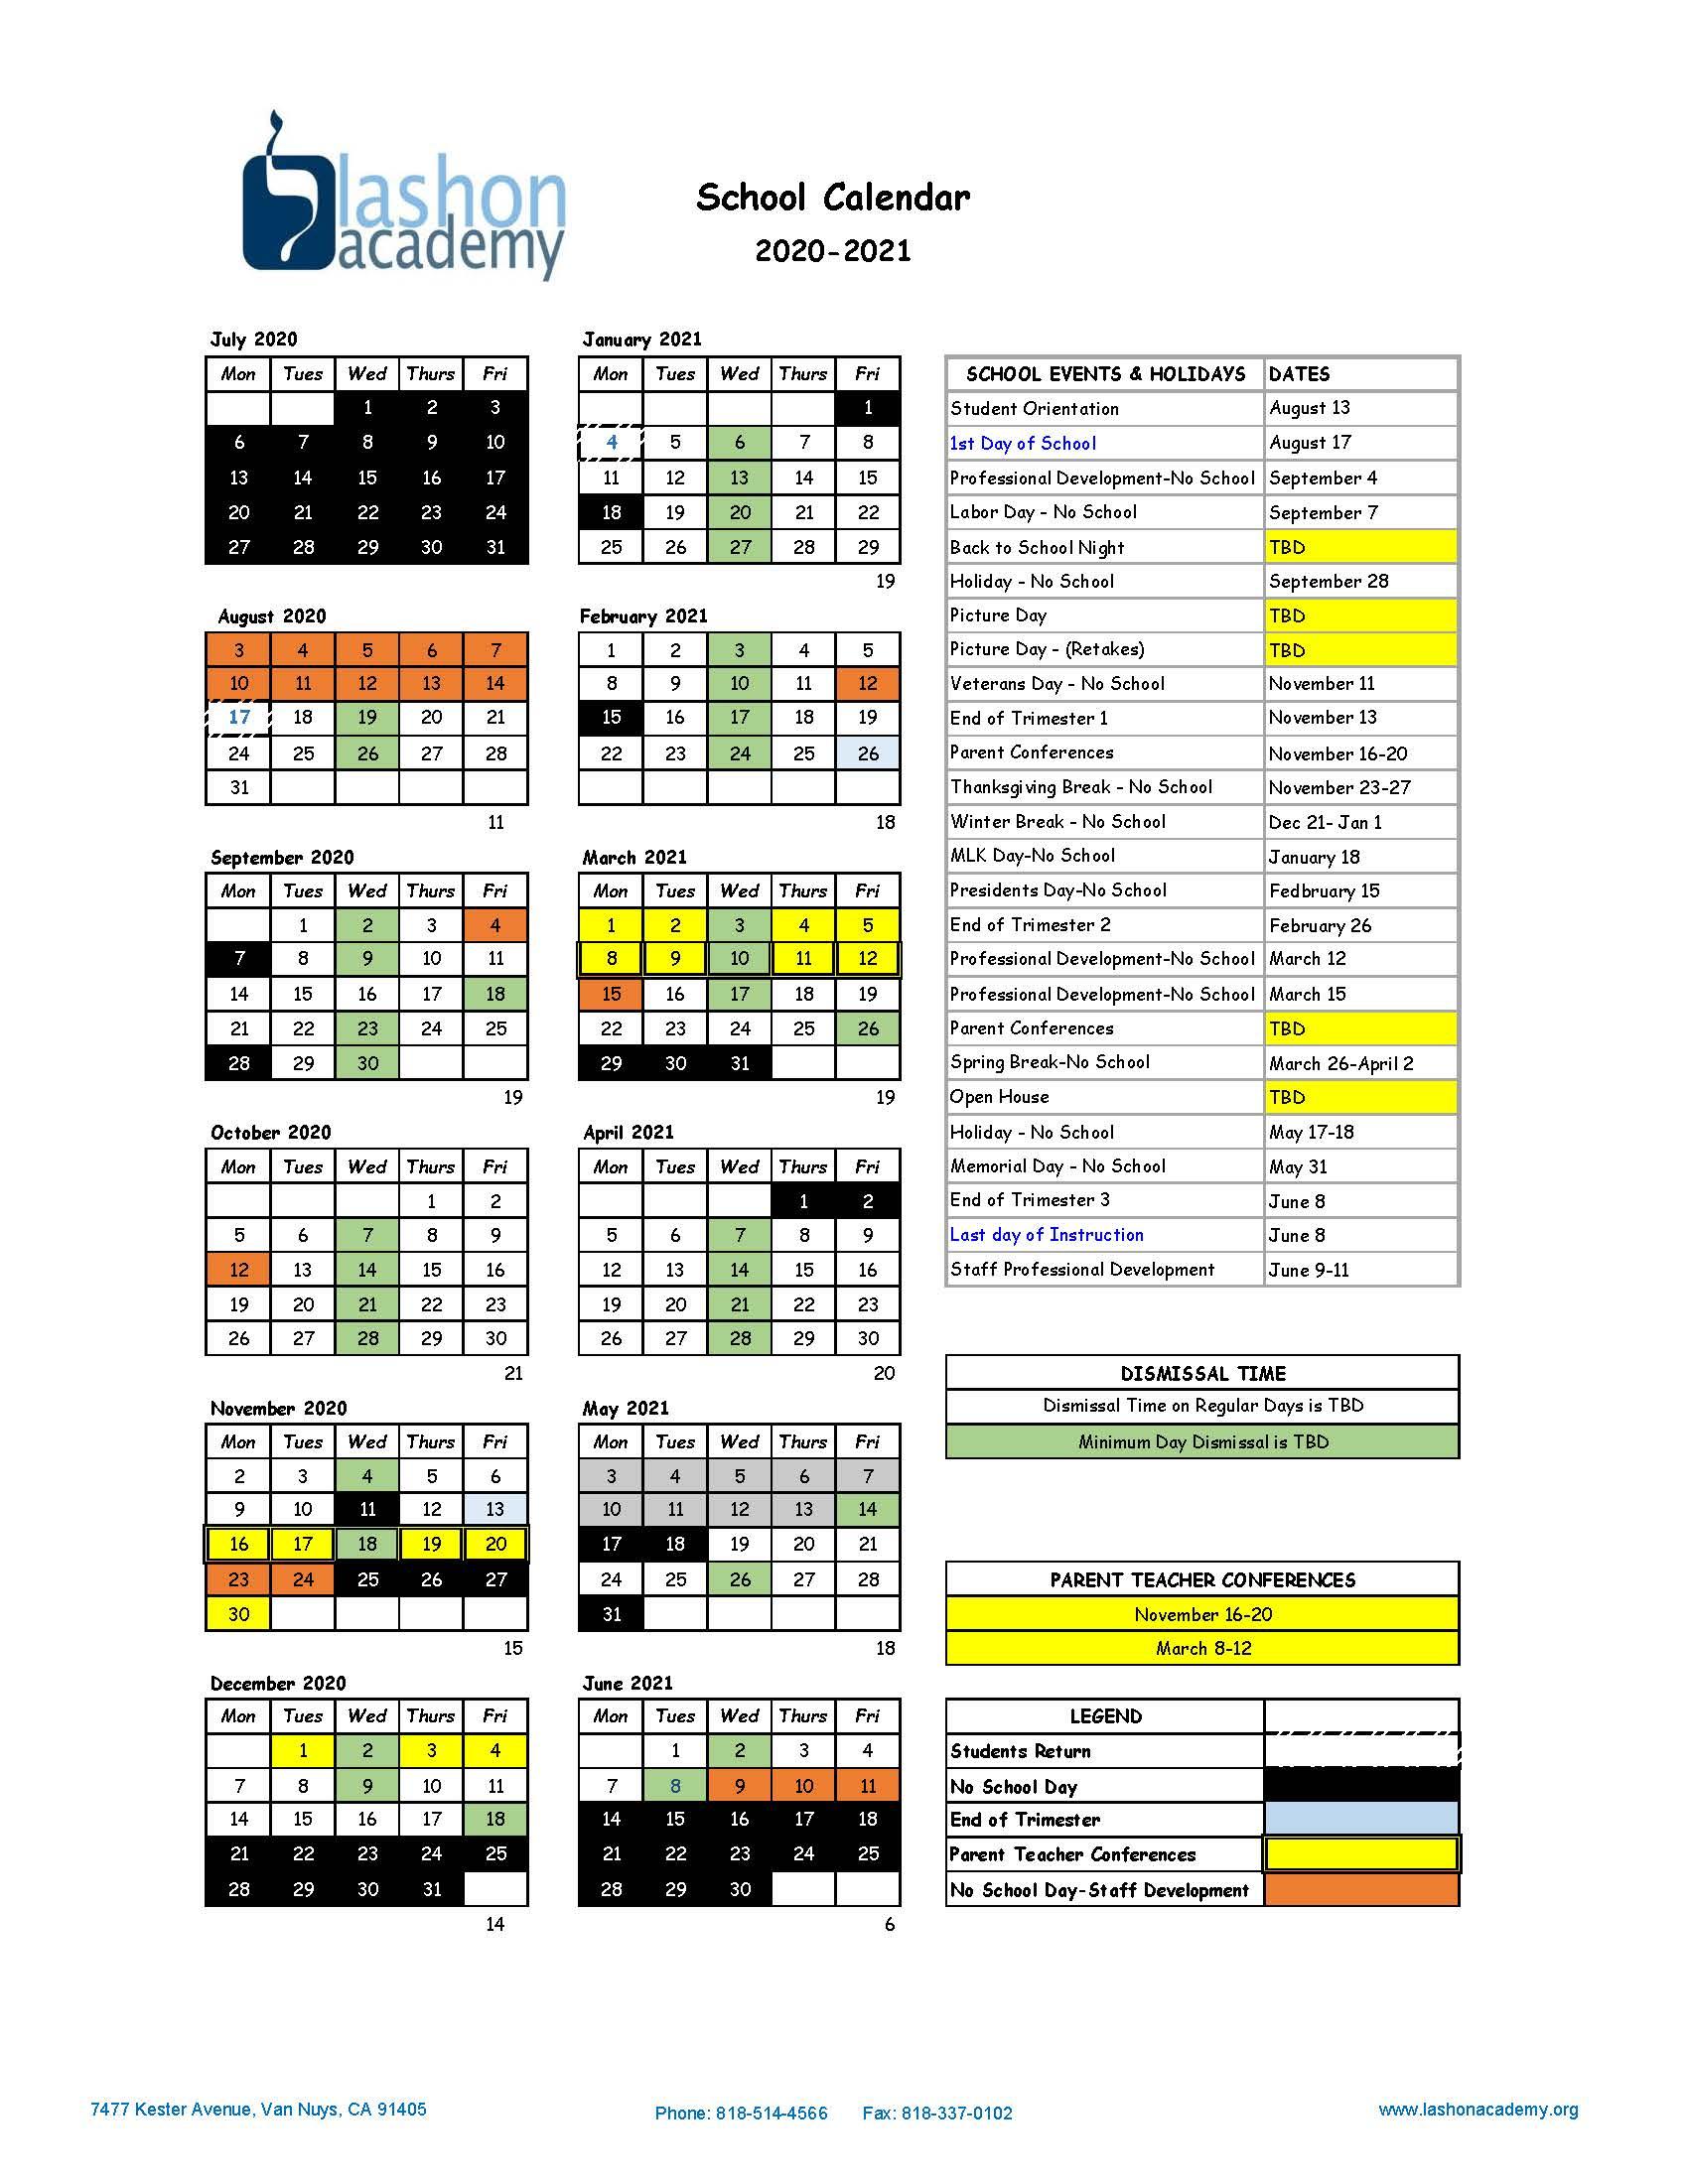 University Of Southern California School Calendar 2021 With Uri School Calendar 2021 2020